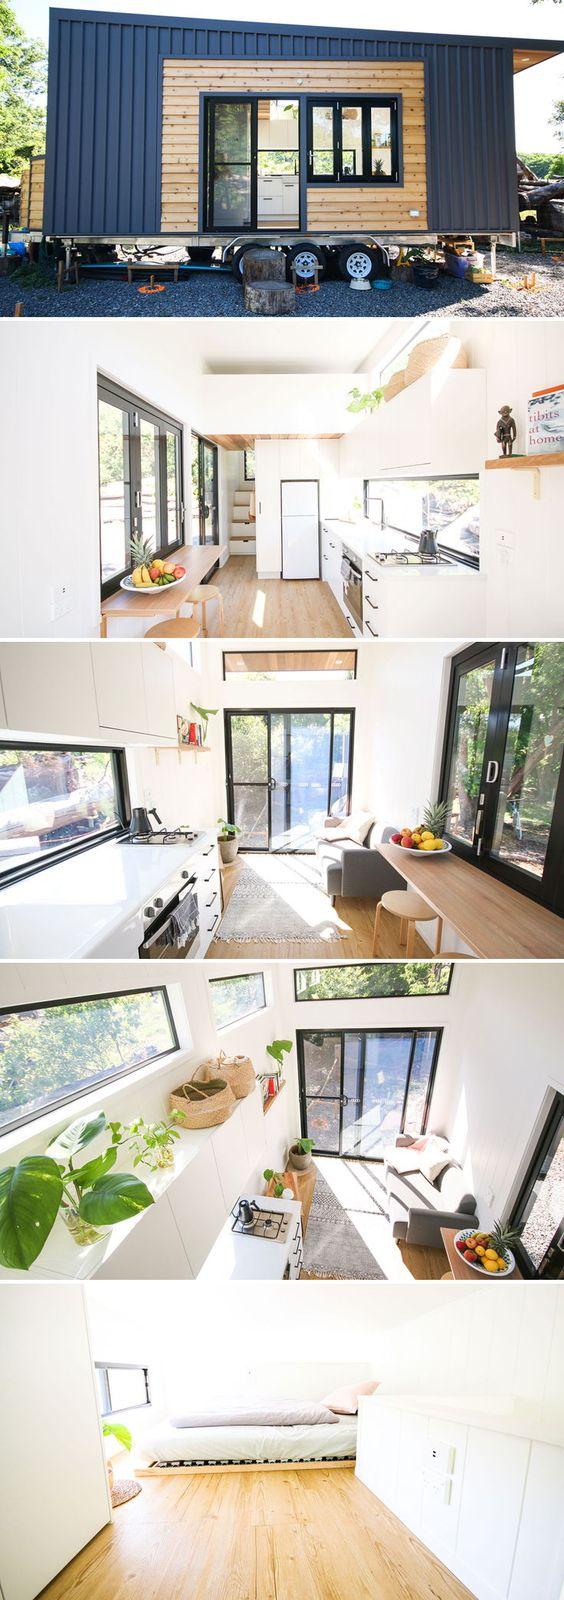 Mooloolaba Australian Tiny Home.jpg